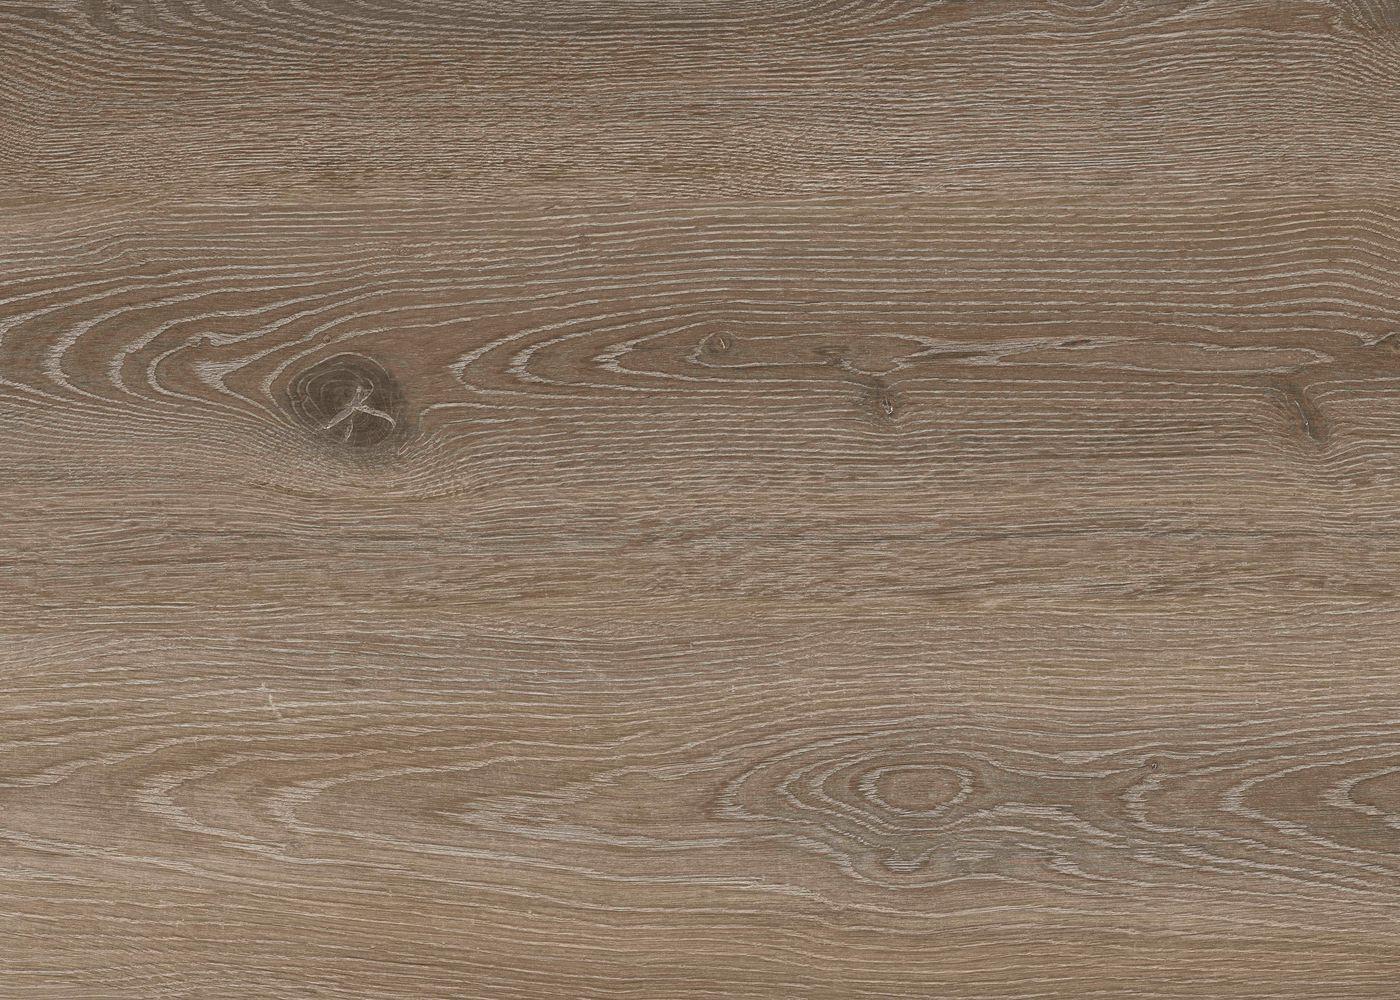 Sol stratifié Chêne Bloom Brun Foncé - Smart 7 - 7x190x1288